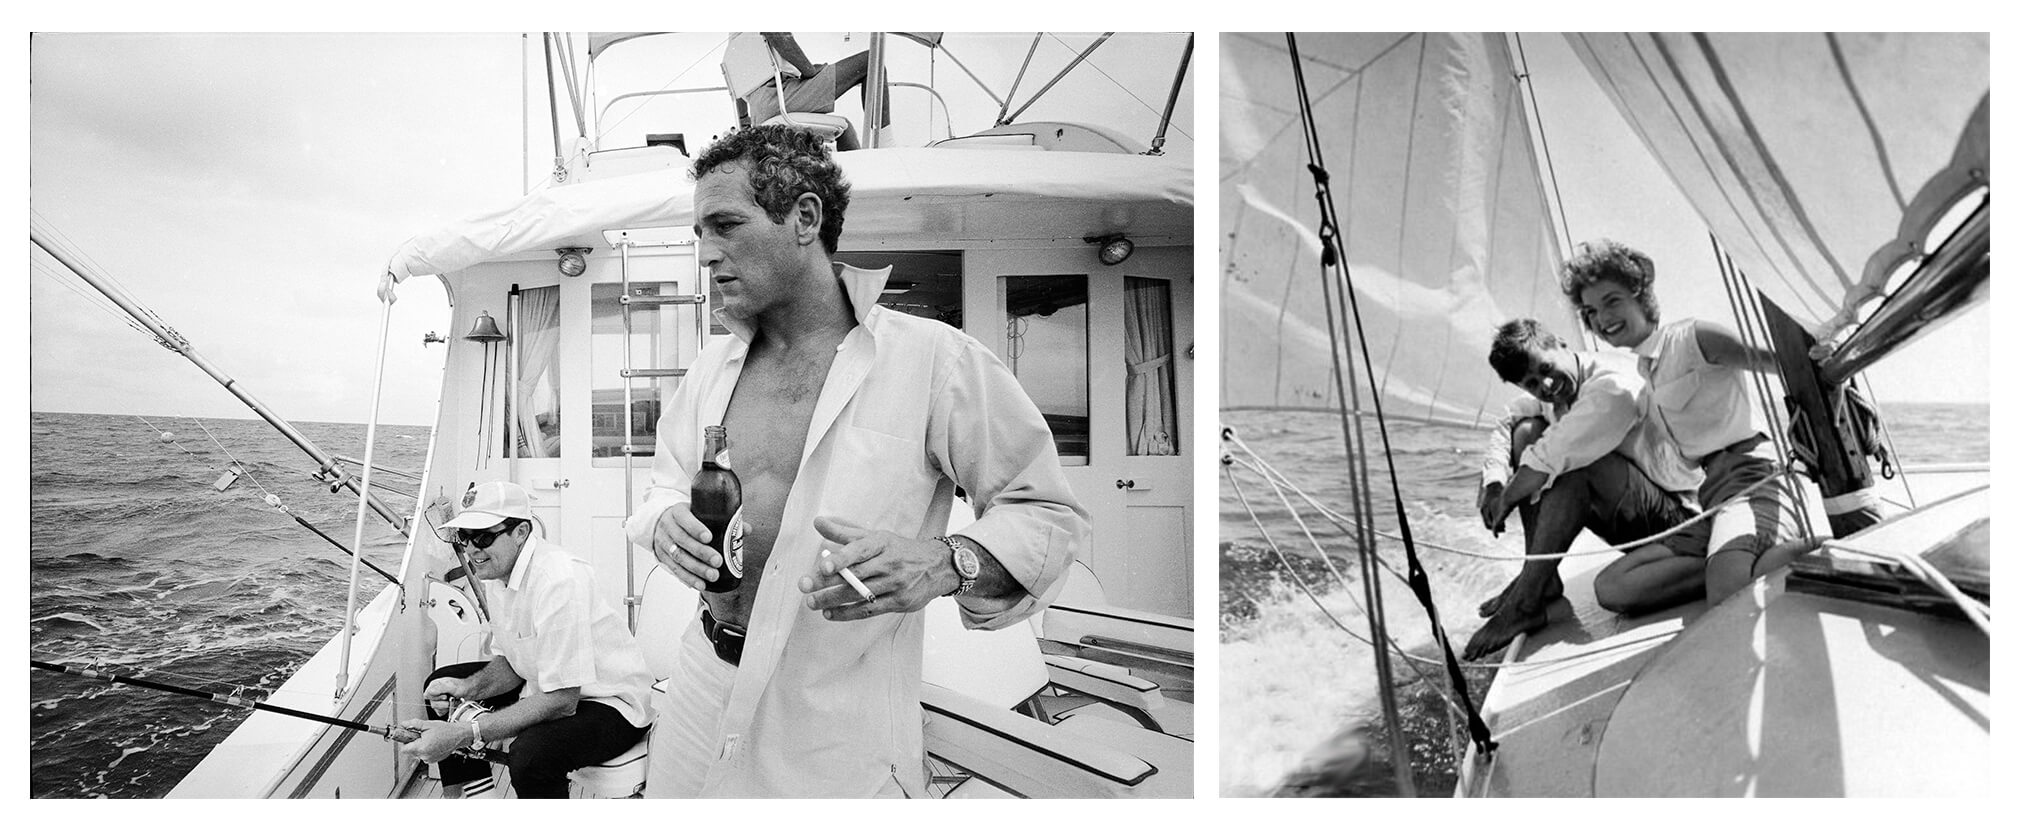 Inspirations John Jackie Kennedy et Paul Newman Voilier